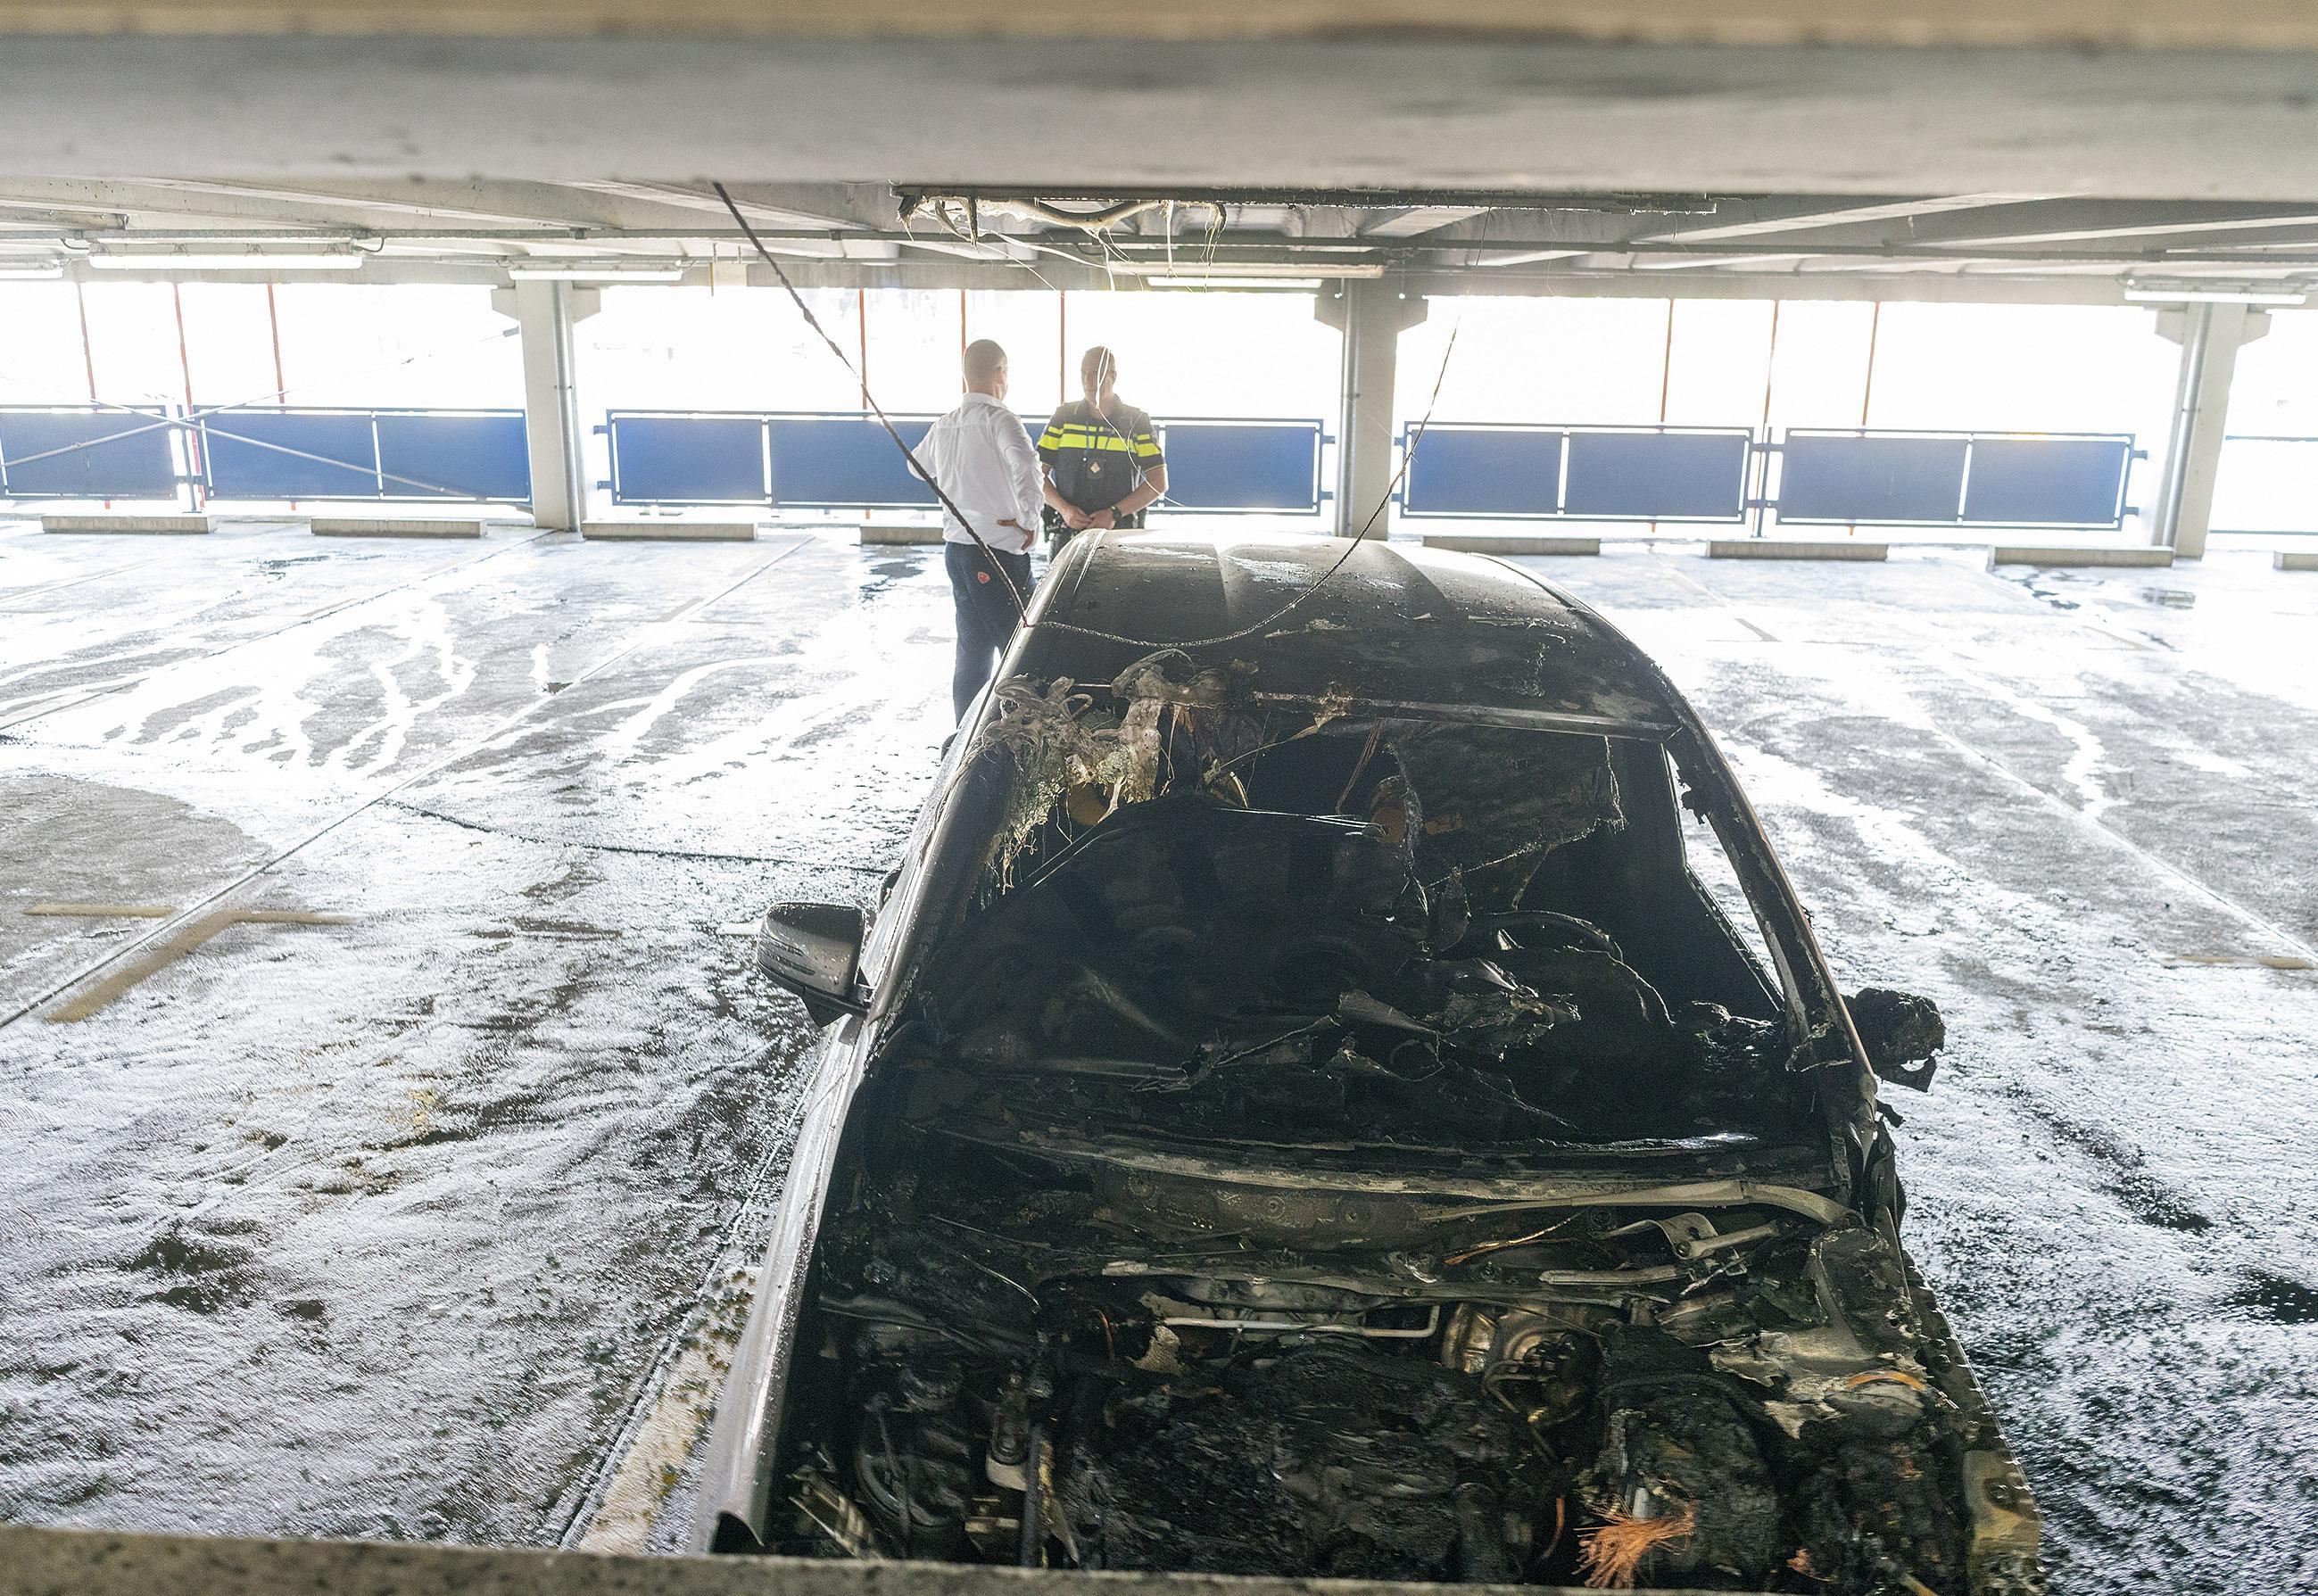 Alkmaar koploper in Noord-Holland Noord met autobranden: het is al 28 keer raak geweest tot halverwege dit jaar